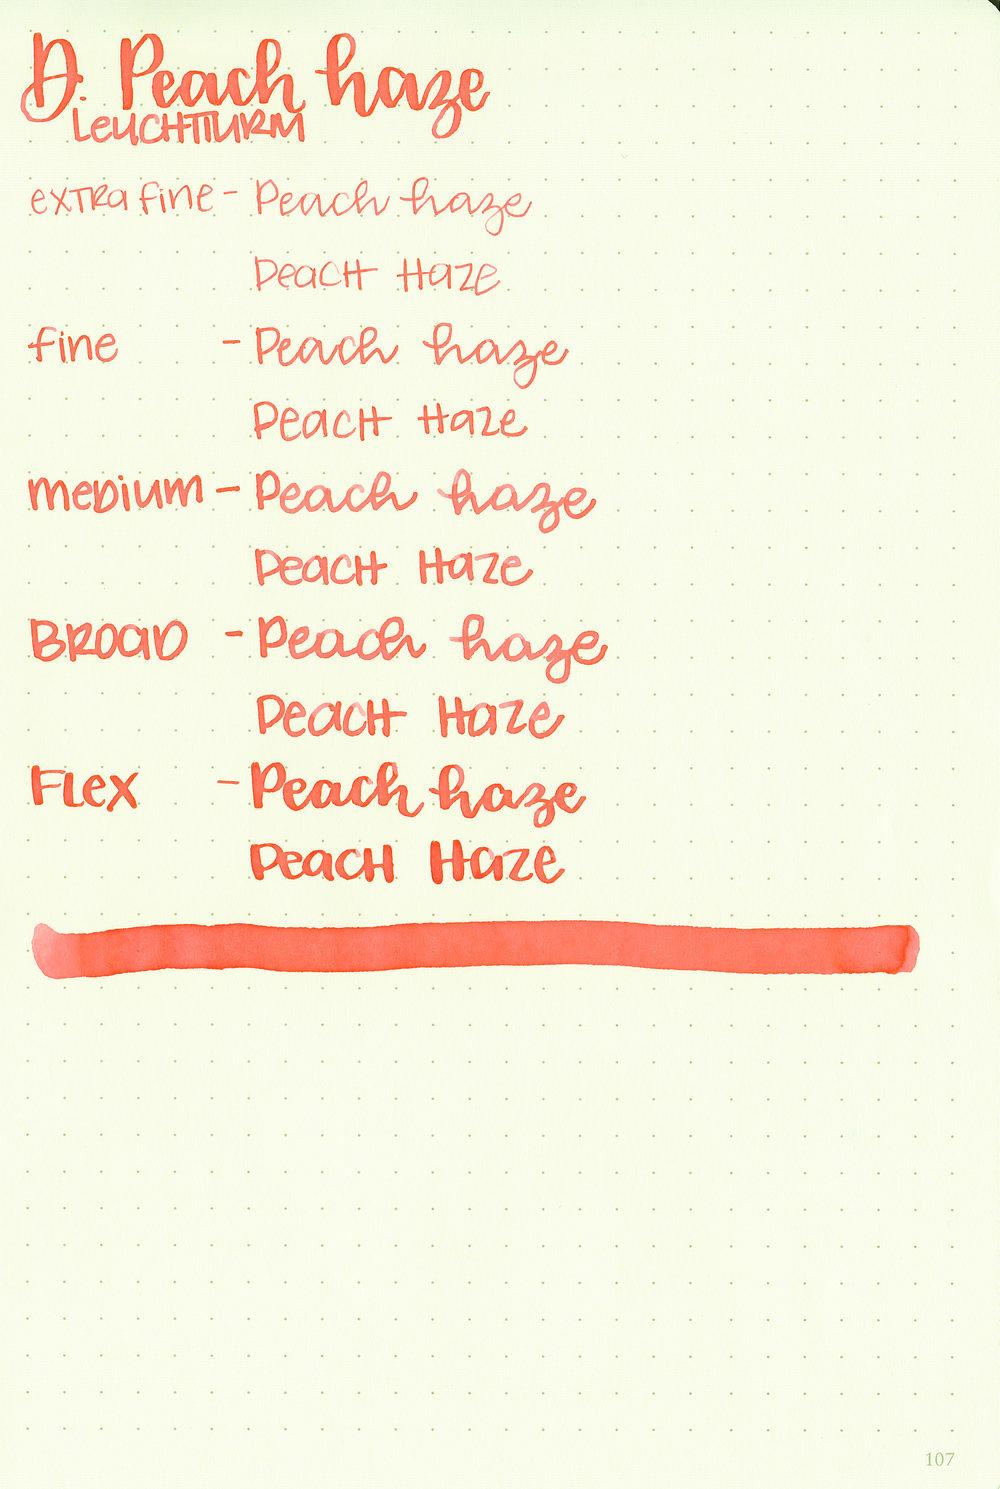 d-peach-haze-11.jpg